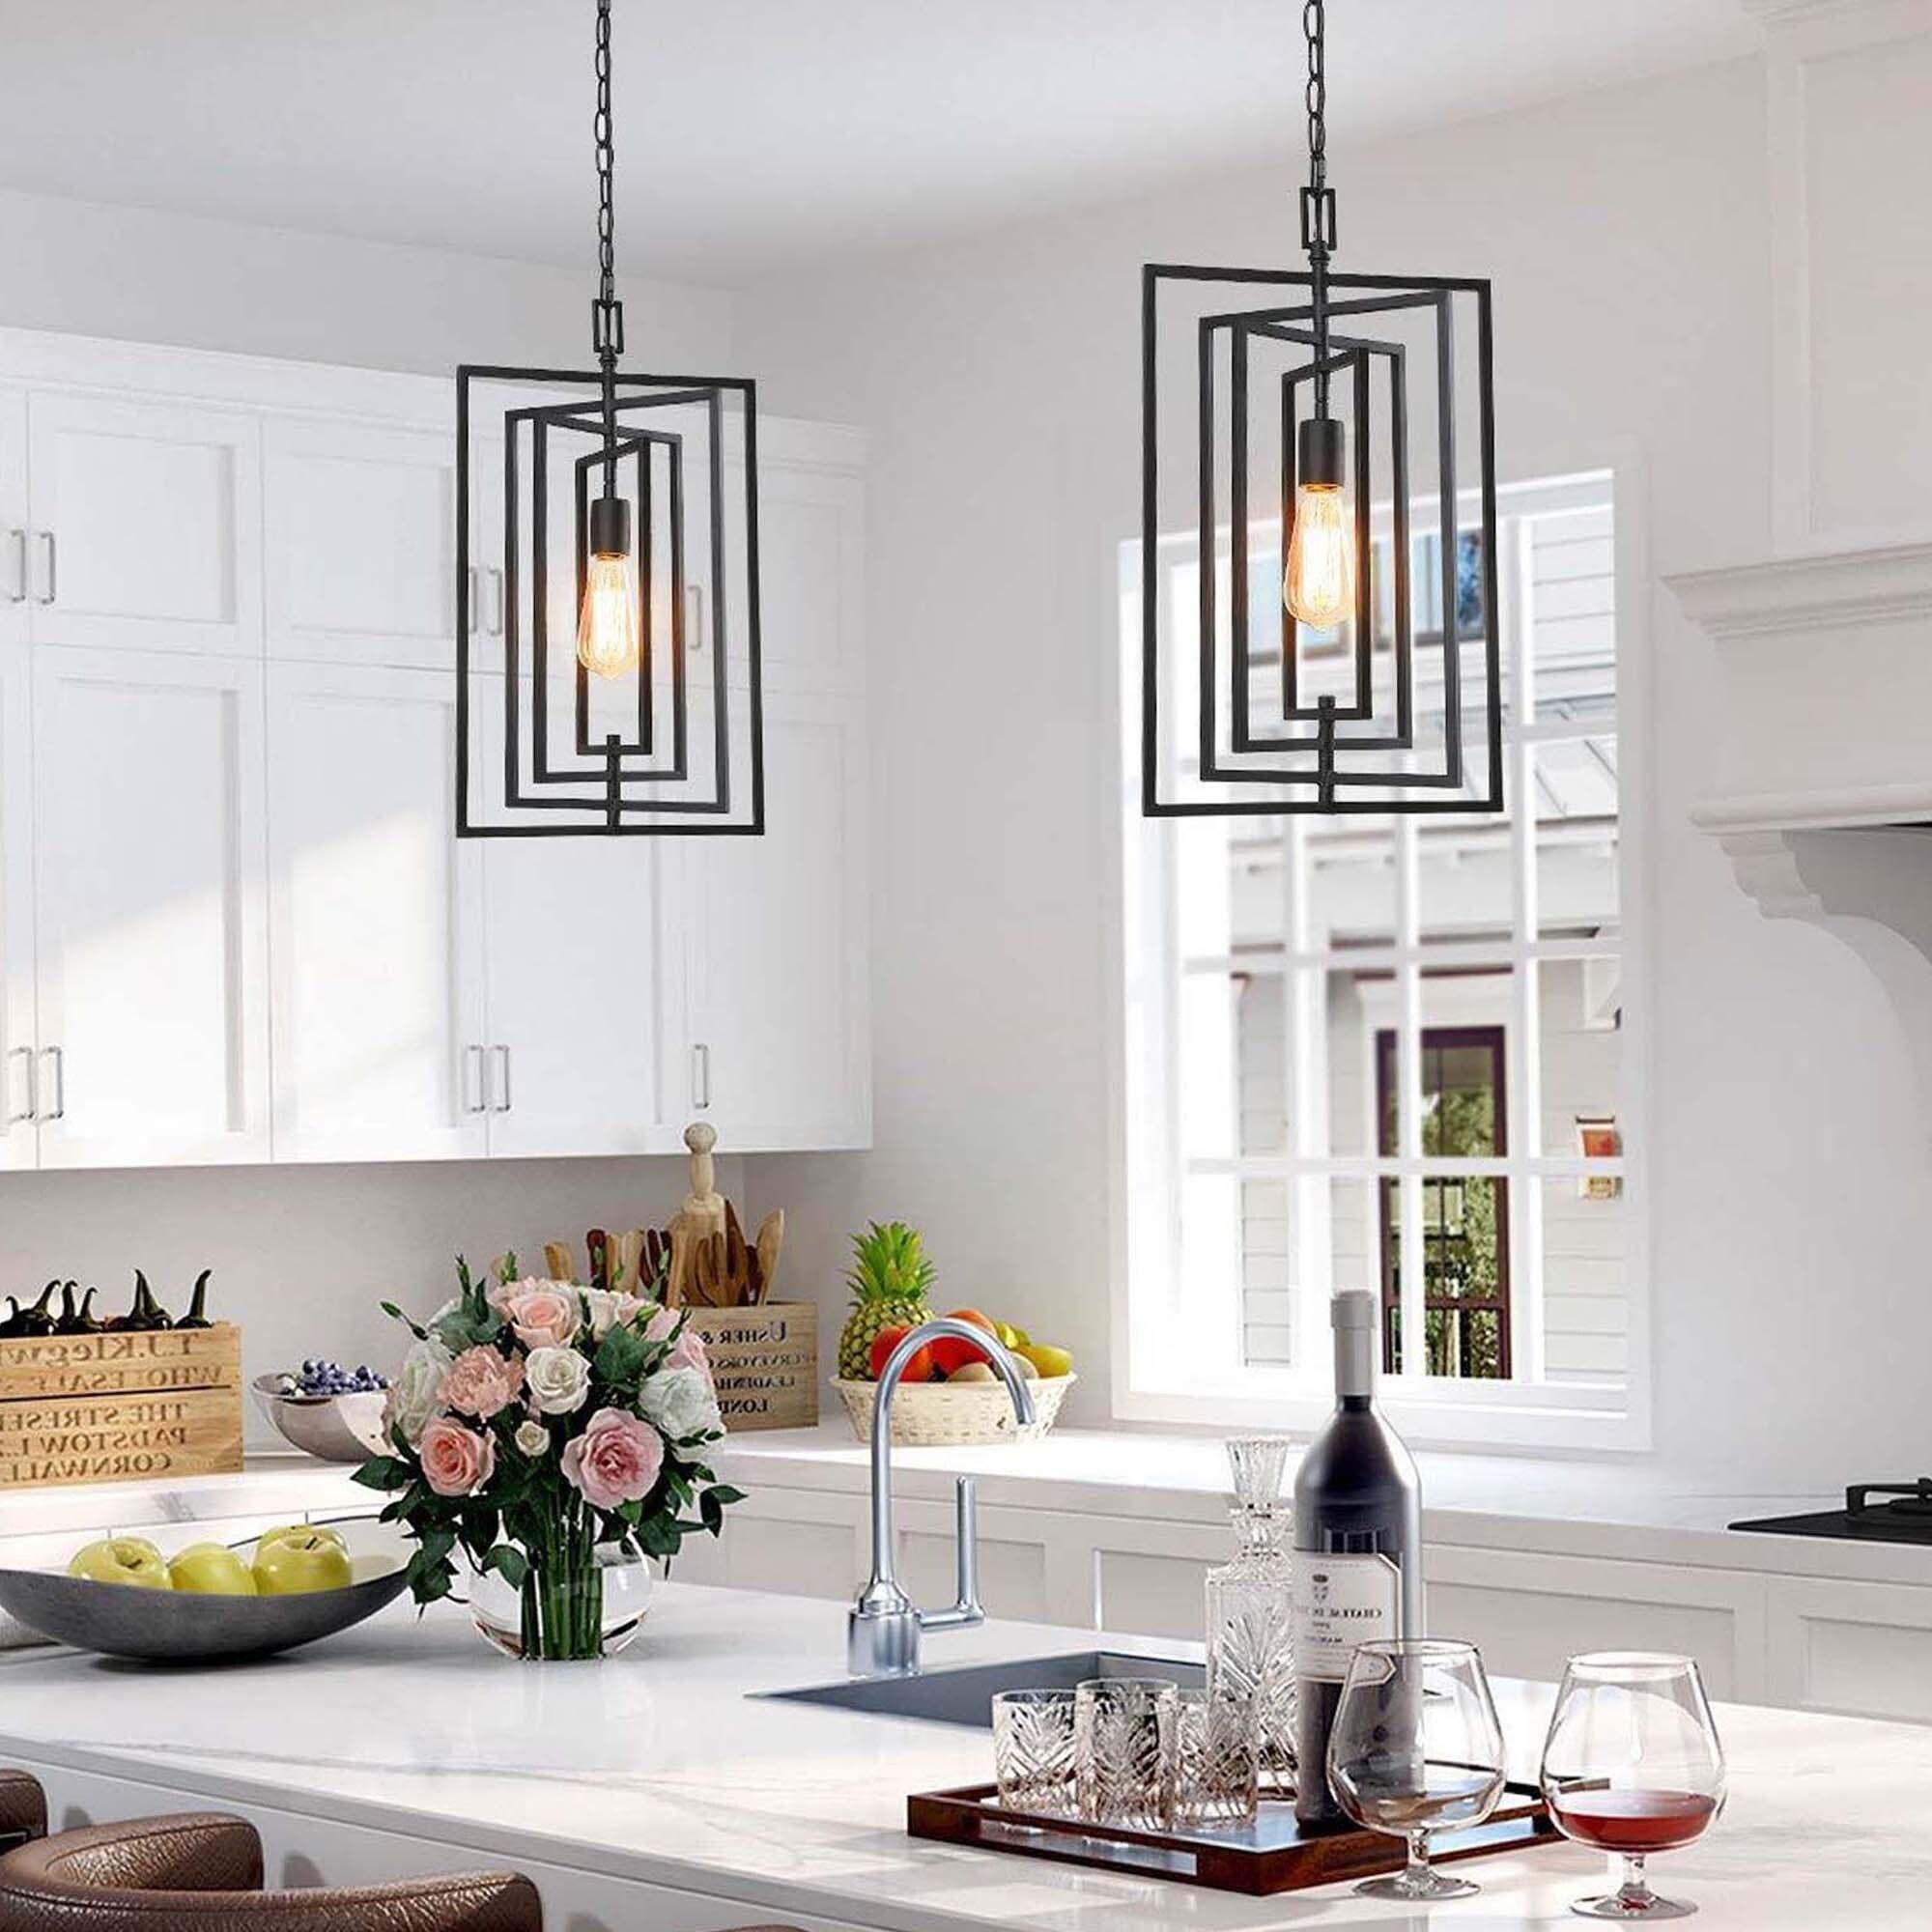 Modern Farmhouse Pendant Black Mini Hanging Ceiling Lighting Fixture For Kitchen W12 Xh20 4 Overstock 30375283